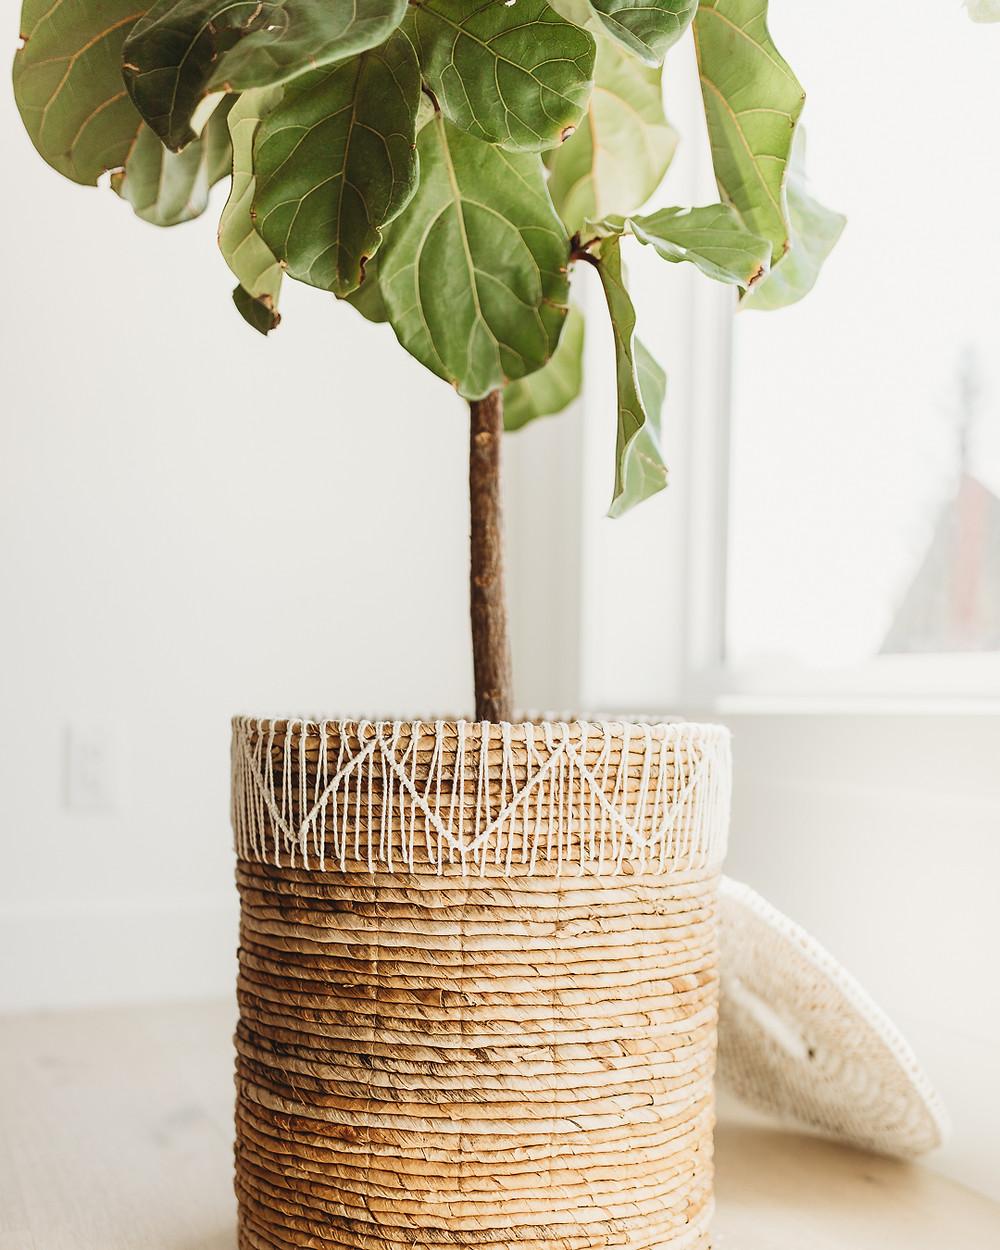 Fiddle leaf fig plant in woven basket on wood floor white walls natural light